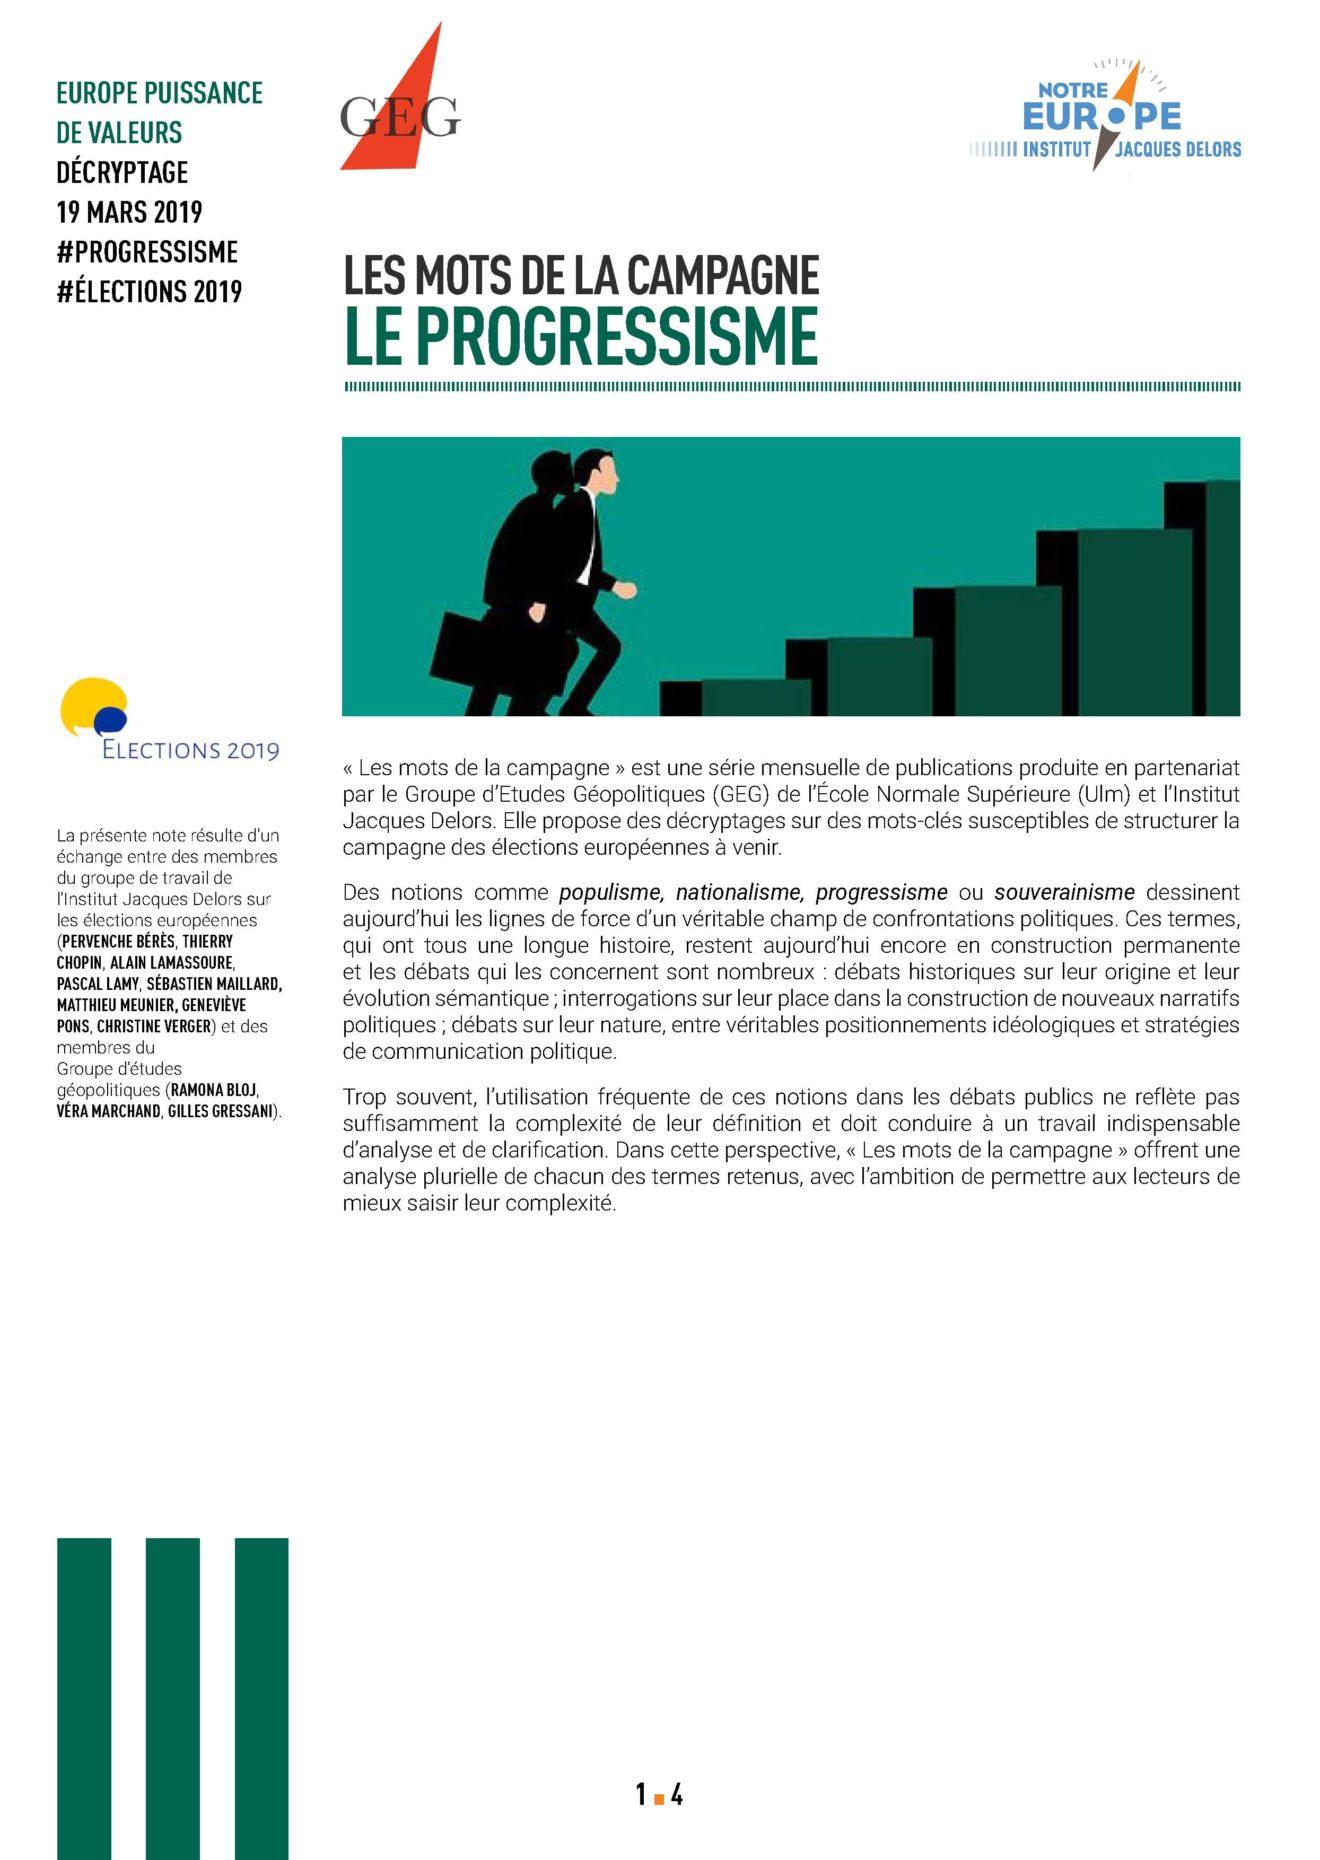 OK-Lesmotsdelacampagneprogressisme-IJDGEG-mars2019_Page_1